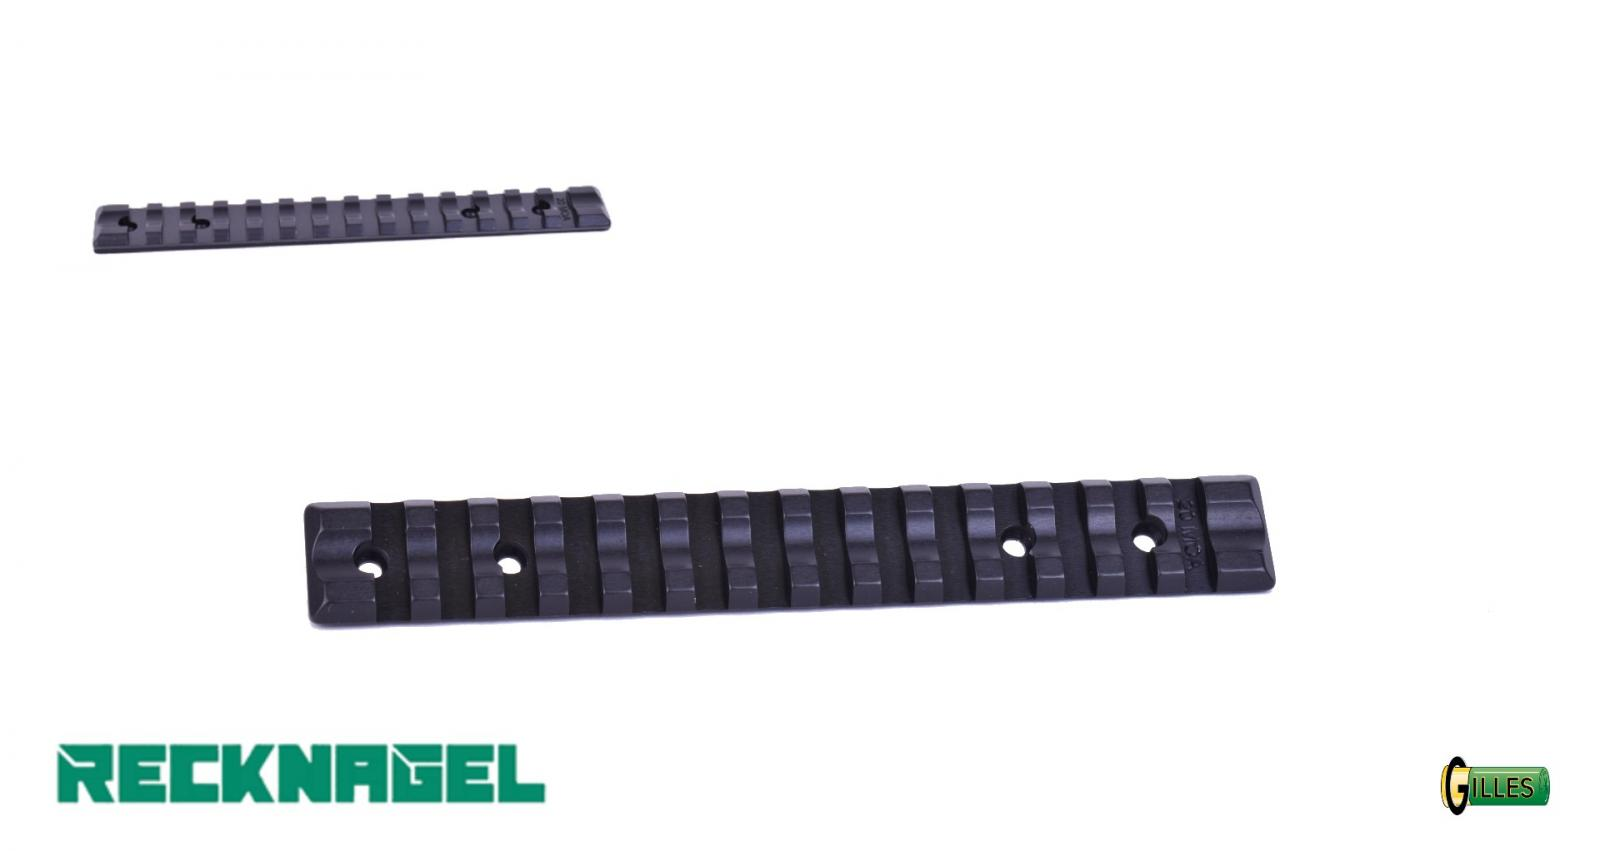 Rail Long Picatinny RECKNAGEL pour Tikka T3 20MOA